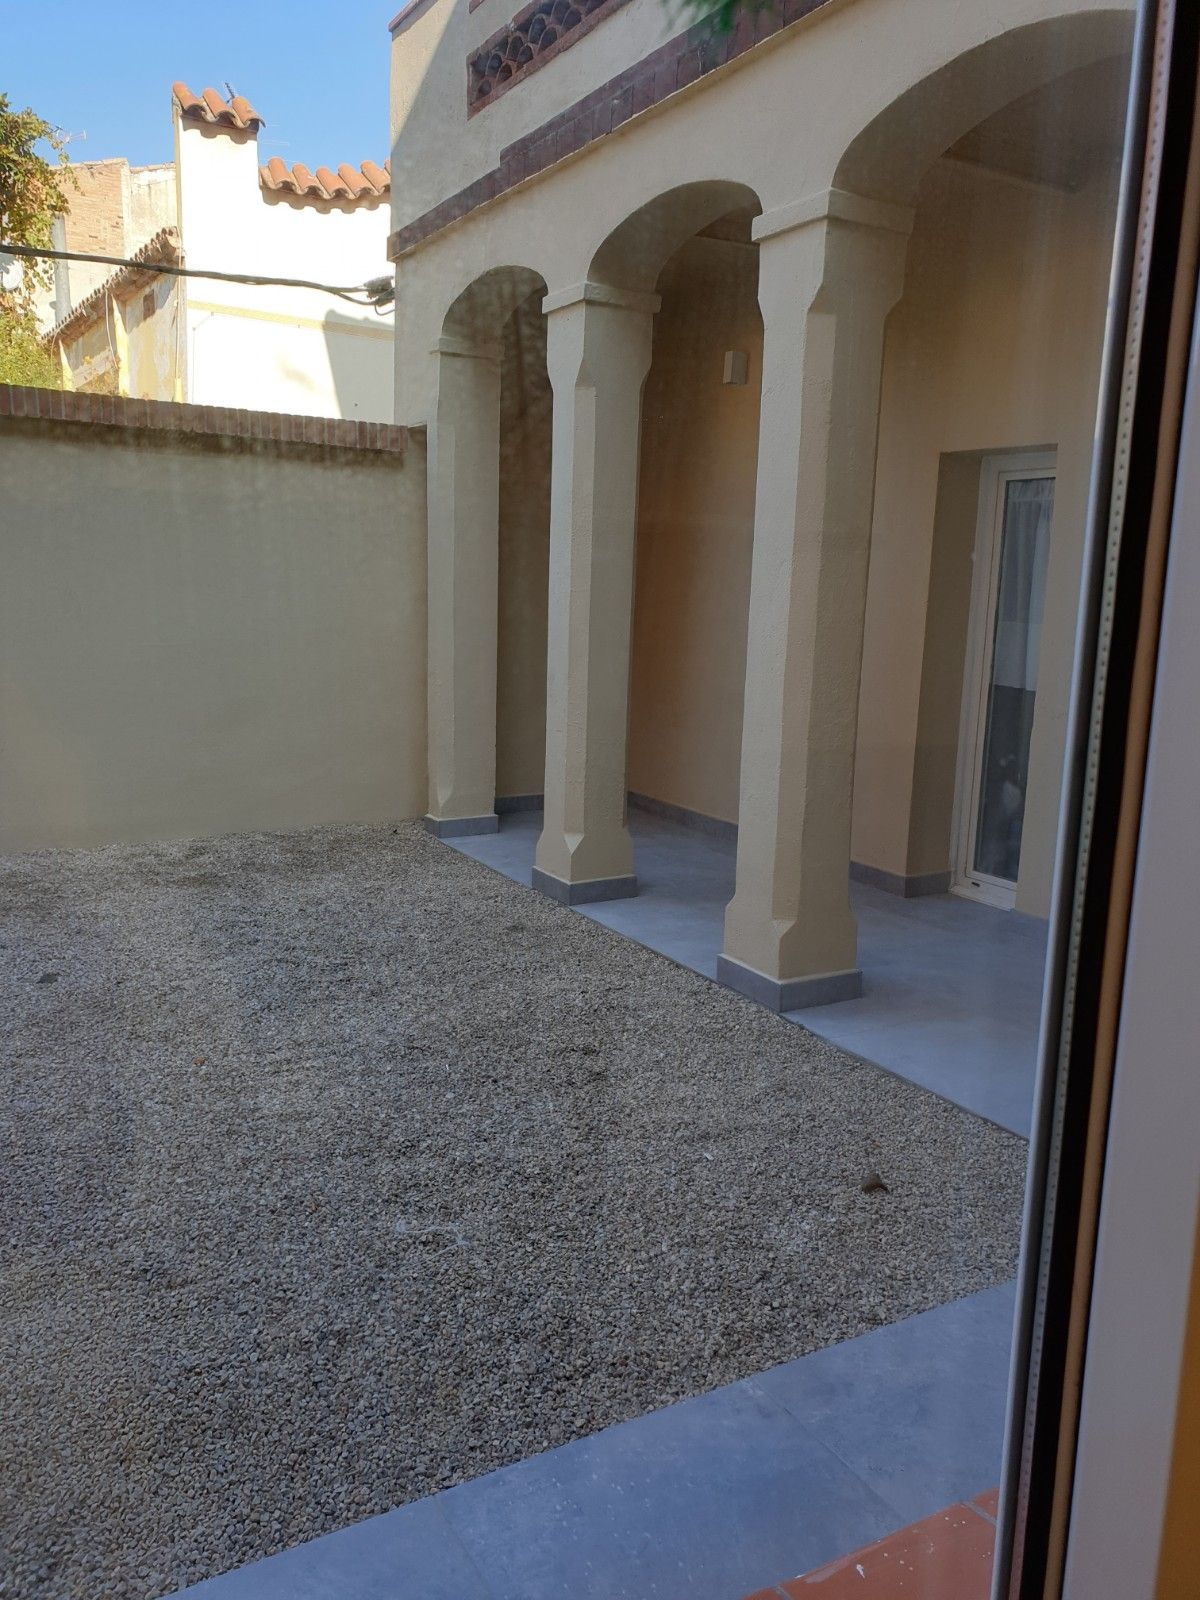 Piso en alquiler en 45464, Esparreguera, Barcelona, Avenida Francesc Macia, 790 €, 2 habitaciones, 1 baño, 108 m2